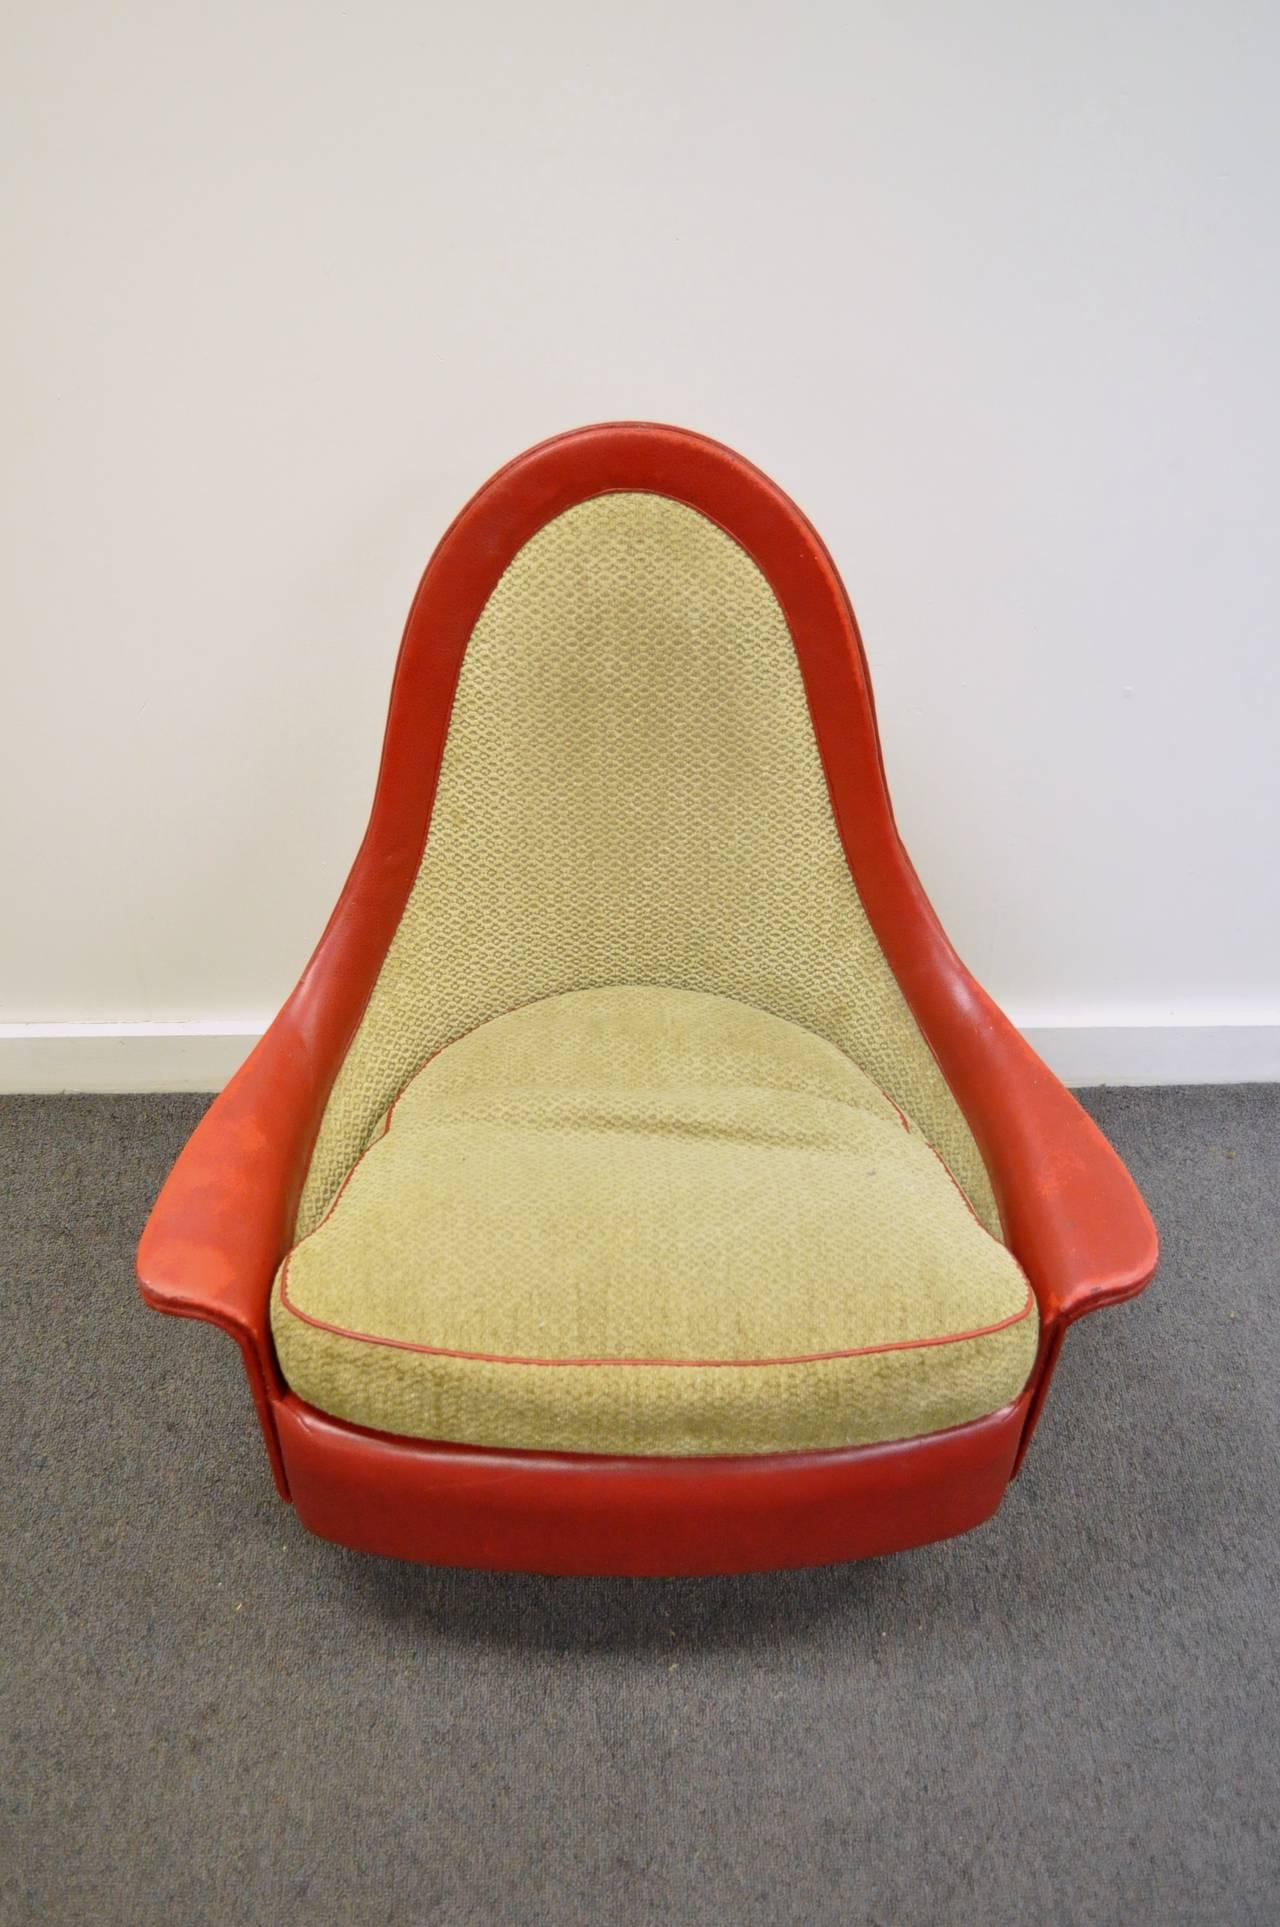 Upholstery Petite Sculptural Milo Baughman Tear Drop Swivel and Tilt Slipper or Club Chair For Sale